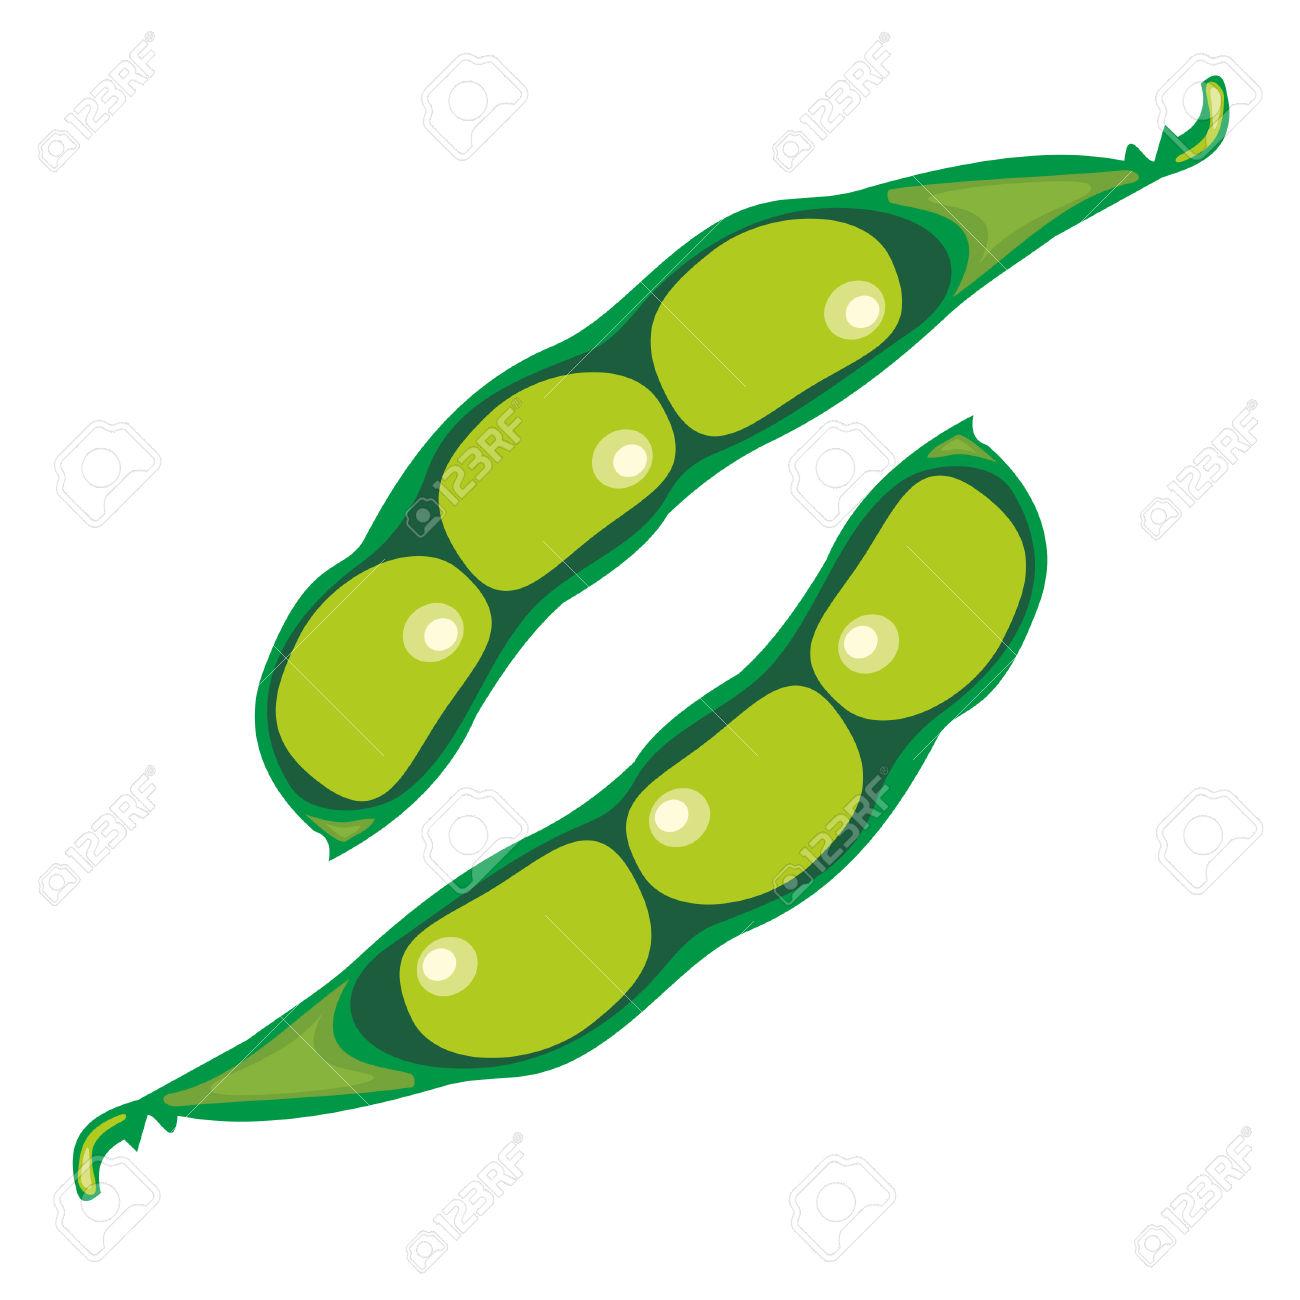 Cliparts free download best. Bean clipart bean pod